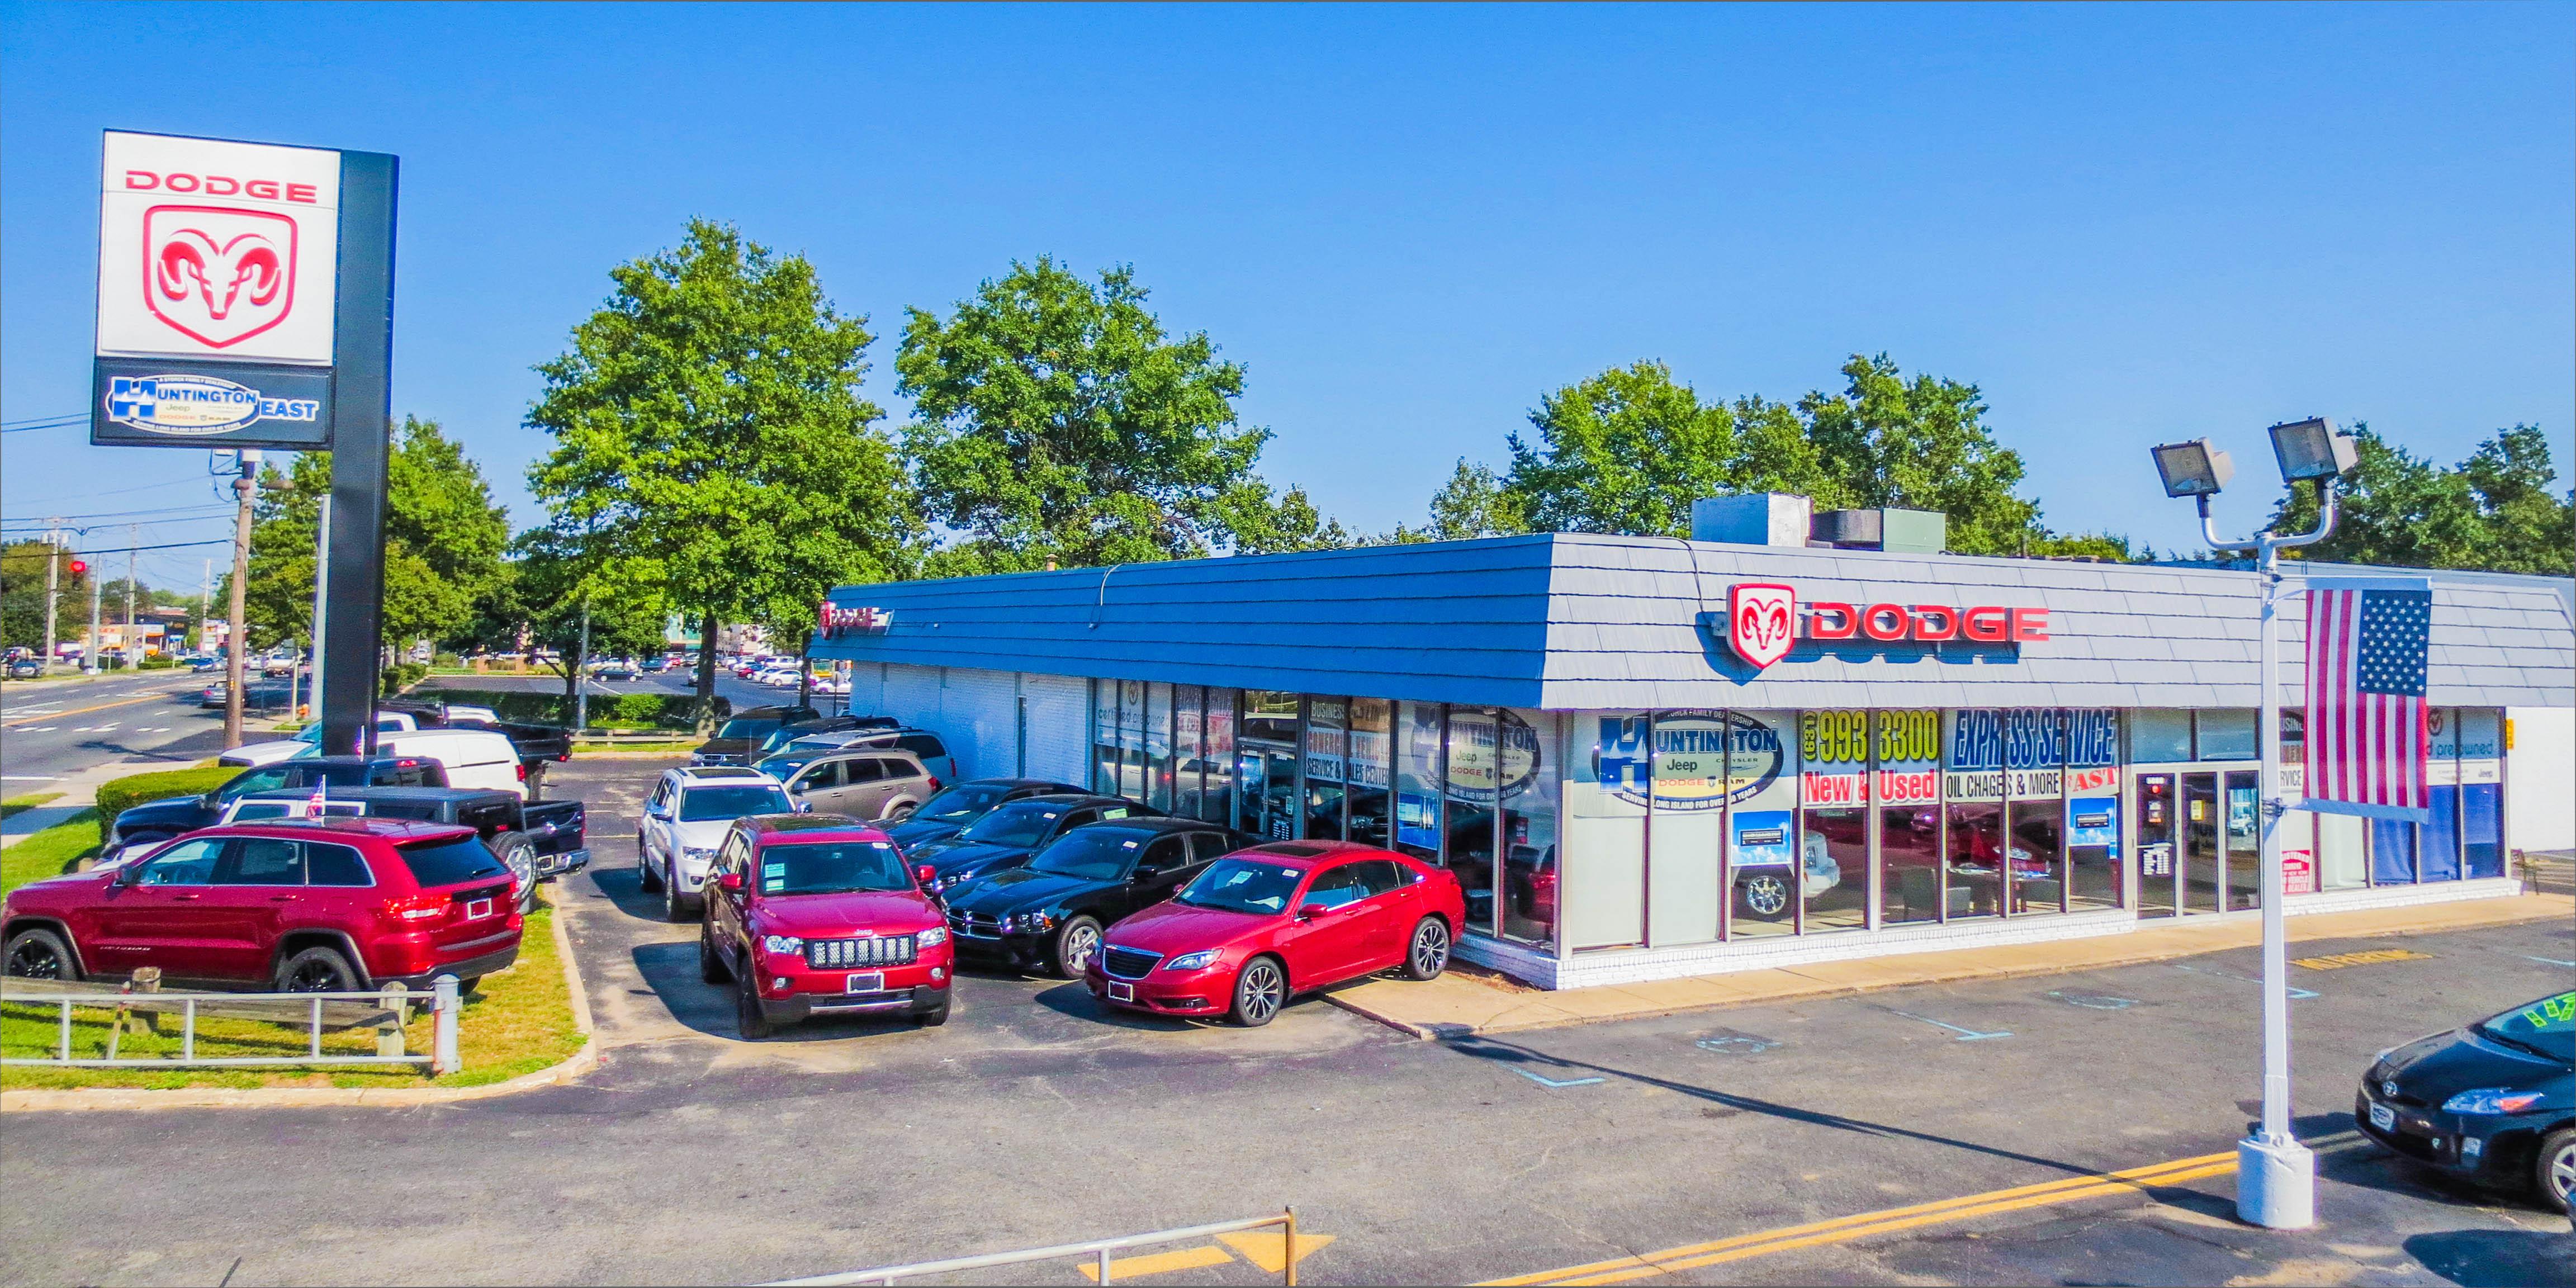 jeep nj dodge exterior gallery may cape chrysler dealer image parts